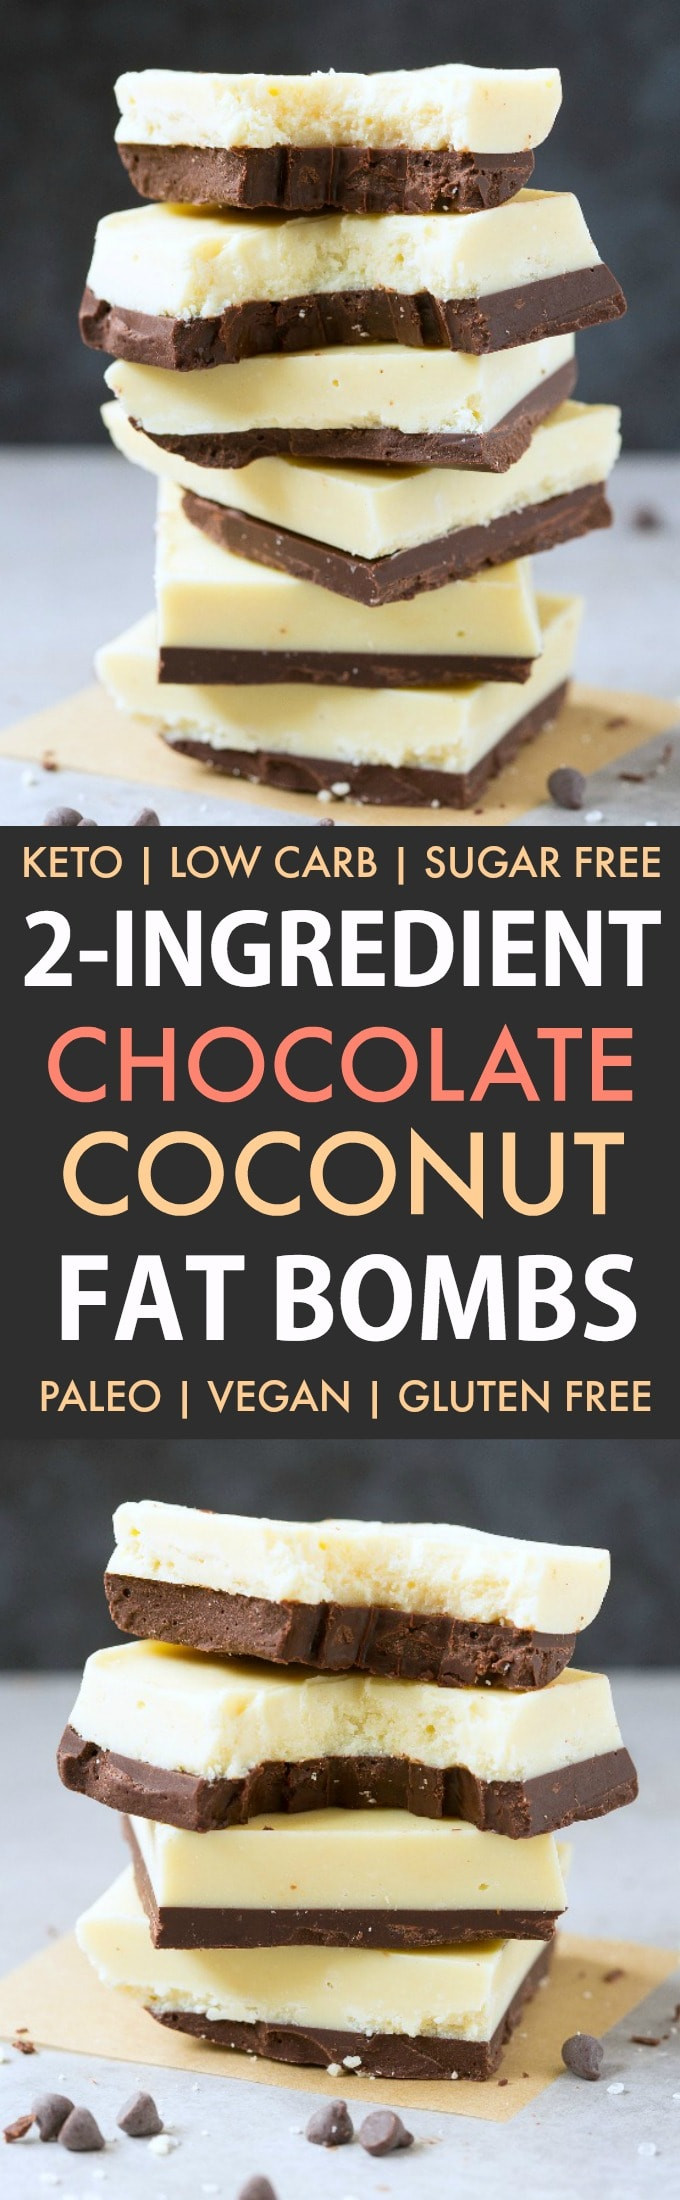 Low Fat Keto Recipes  Low Carb Keto Chocolate Coconut Fat Bombs Paleo Vegan